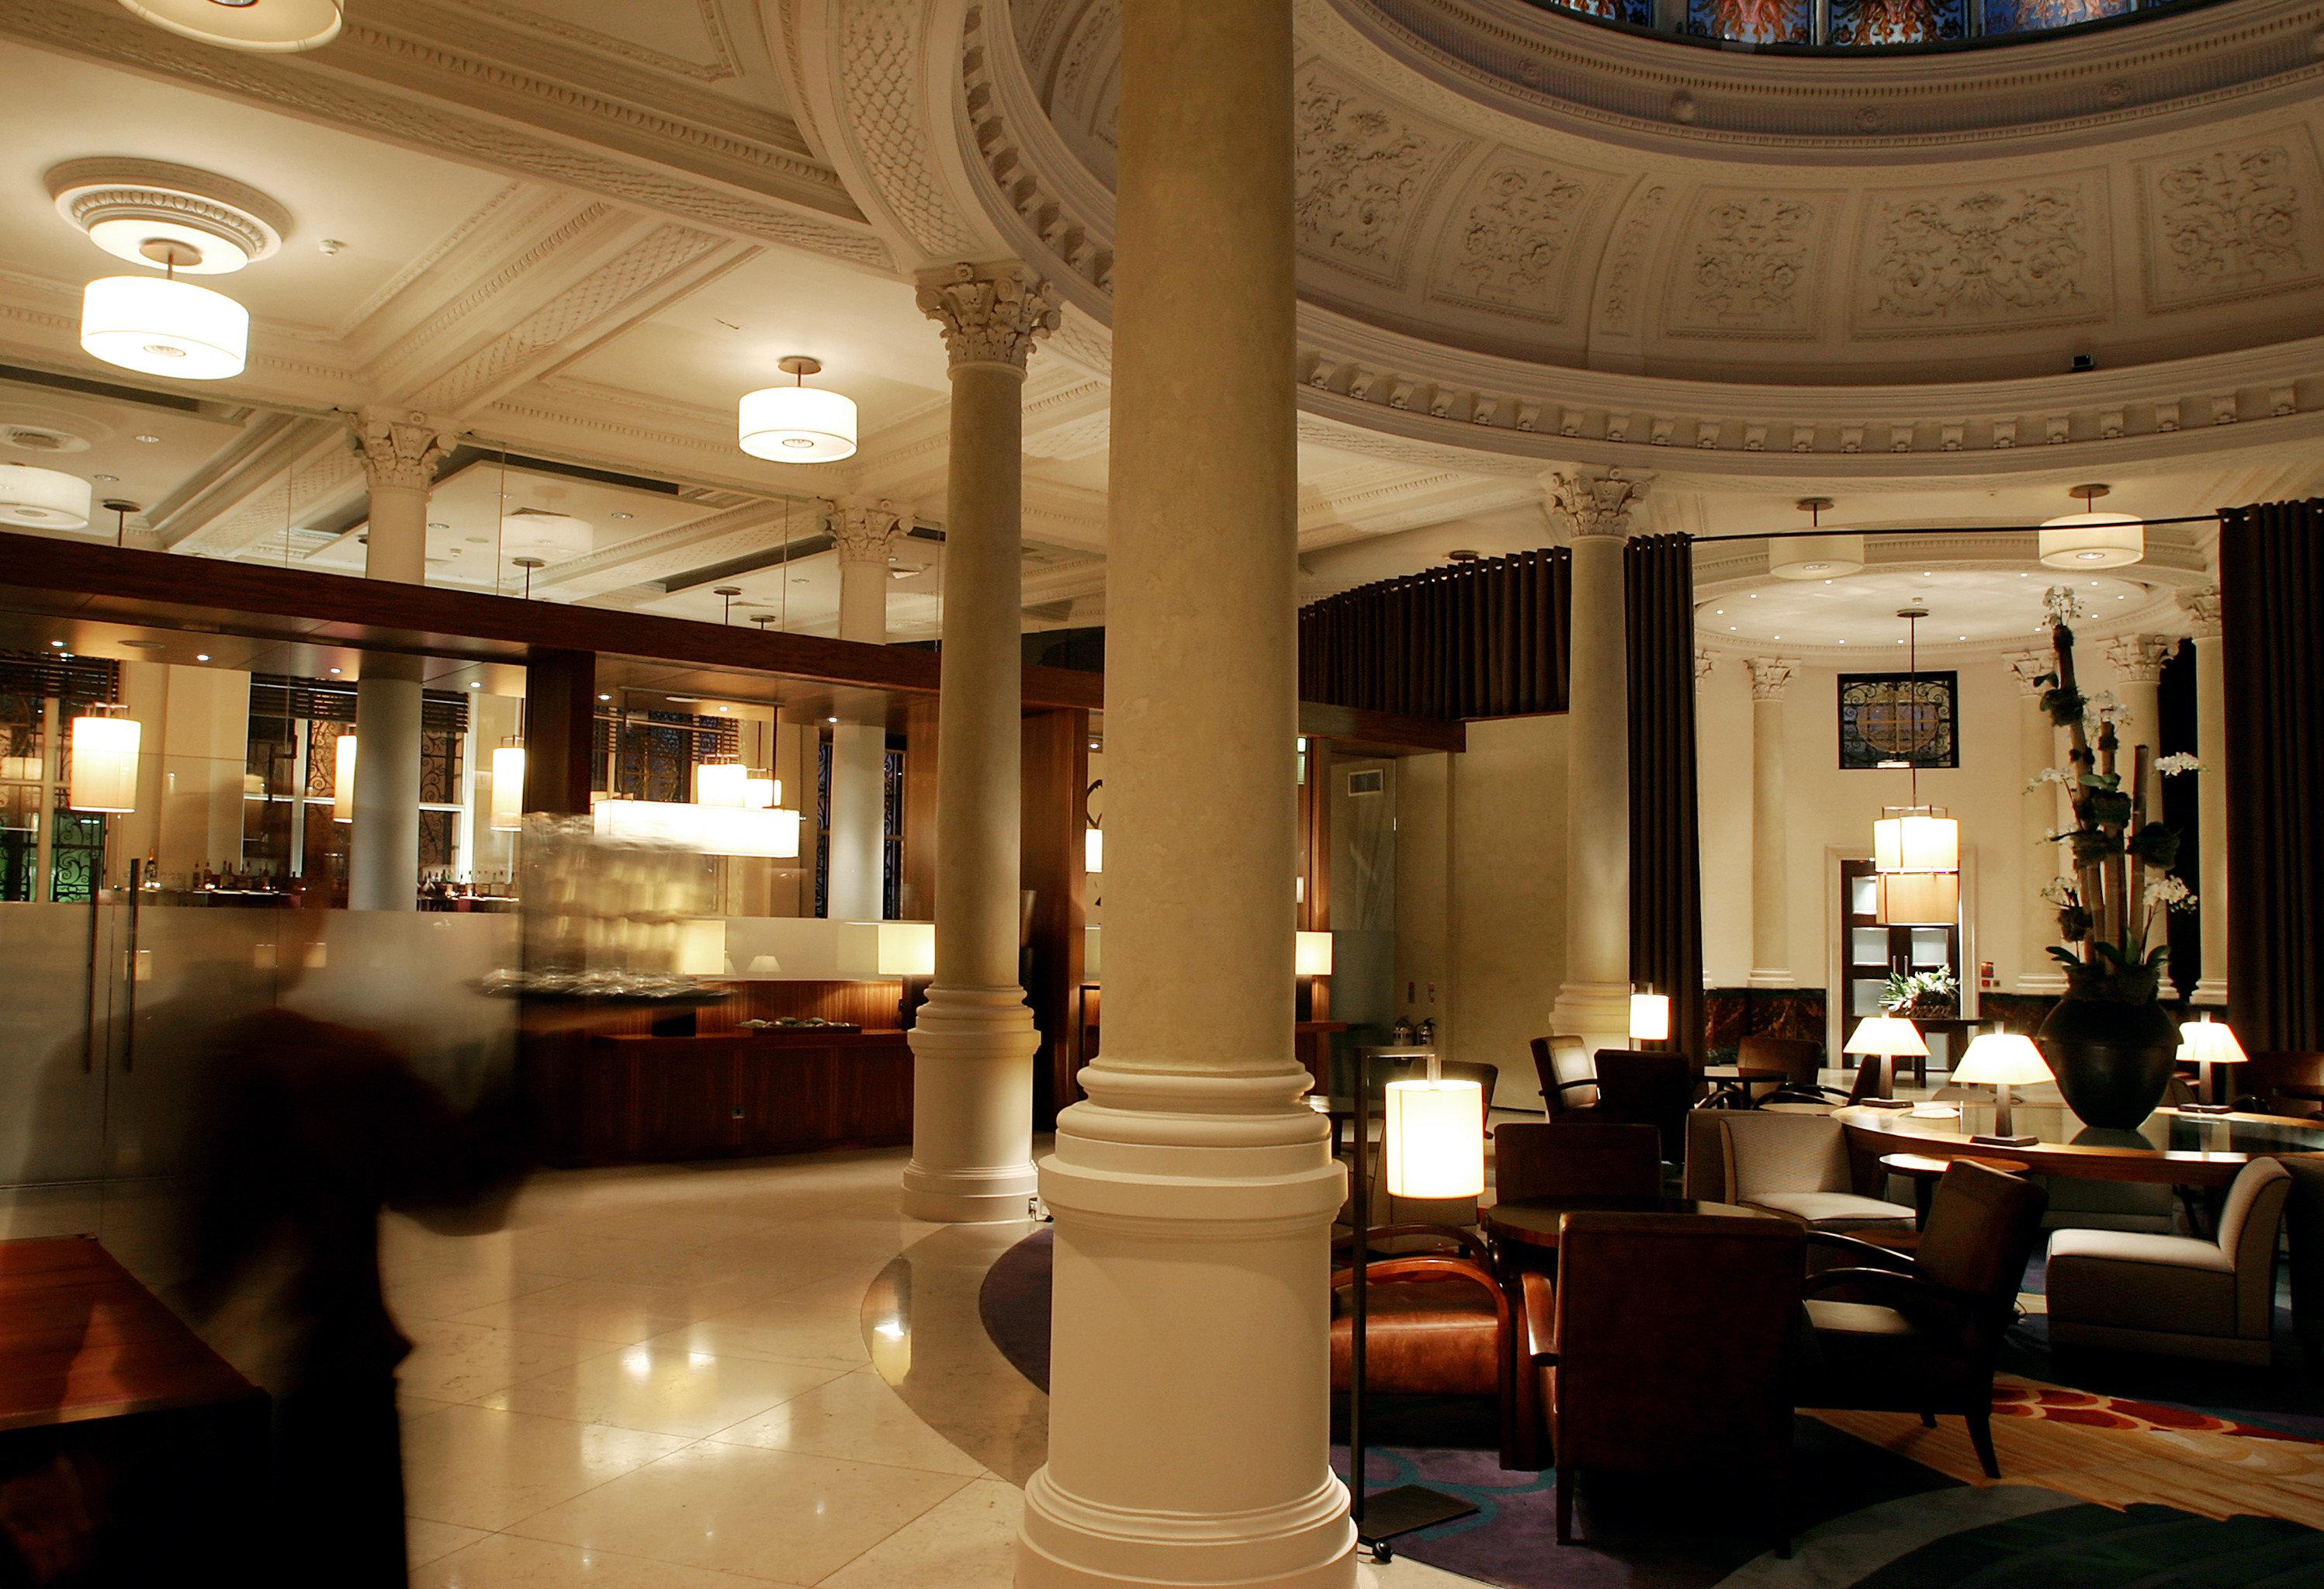 Hip Lobby Lounge Luxury Modern restaurant lighting function hall palace ballroom